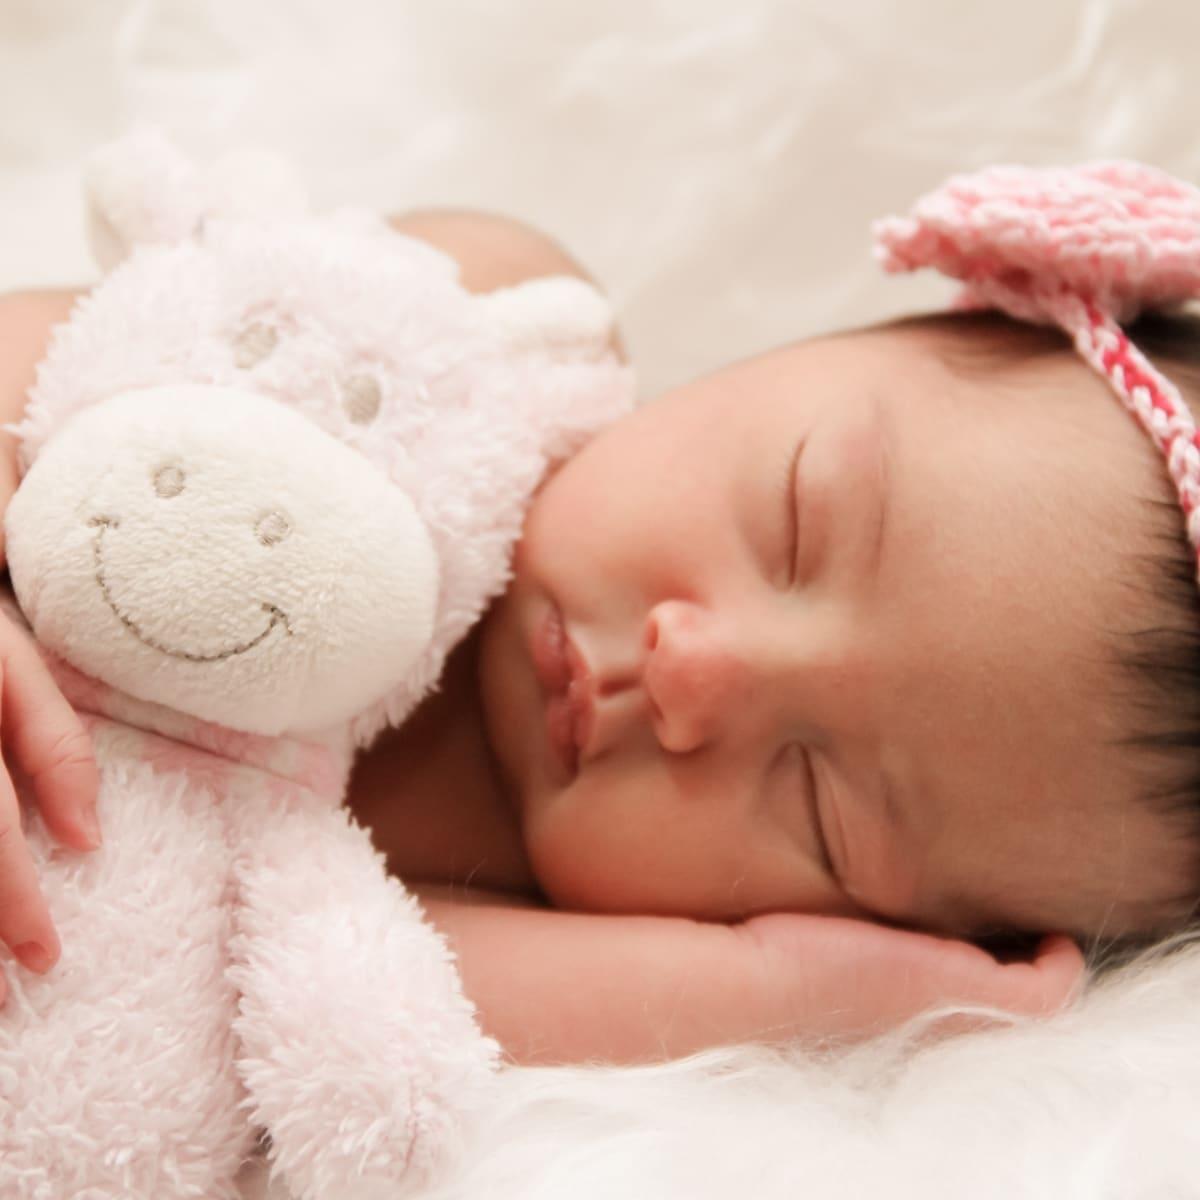 Newborn-Warm-Light-Before-8